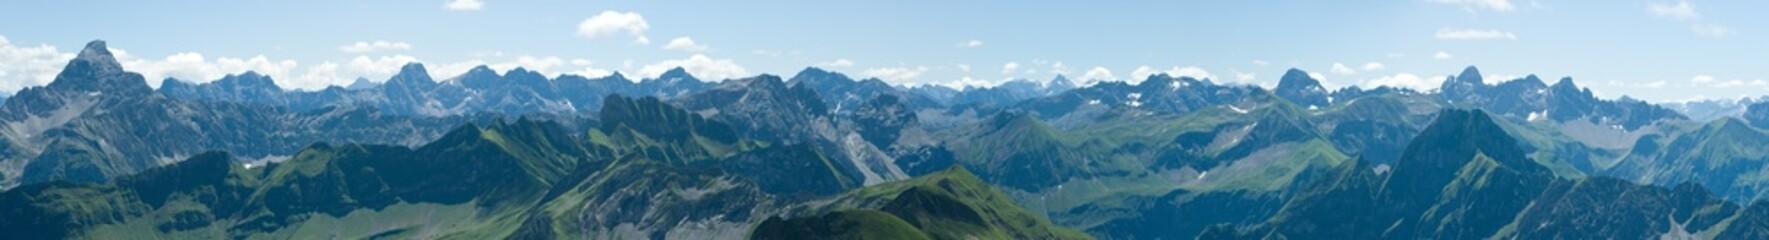 Berge - Alpen - Allgäu - Blick vom Nebelhorn